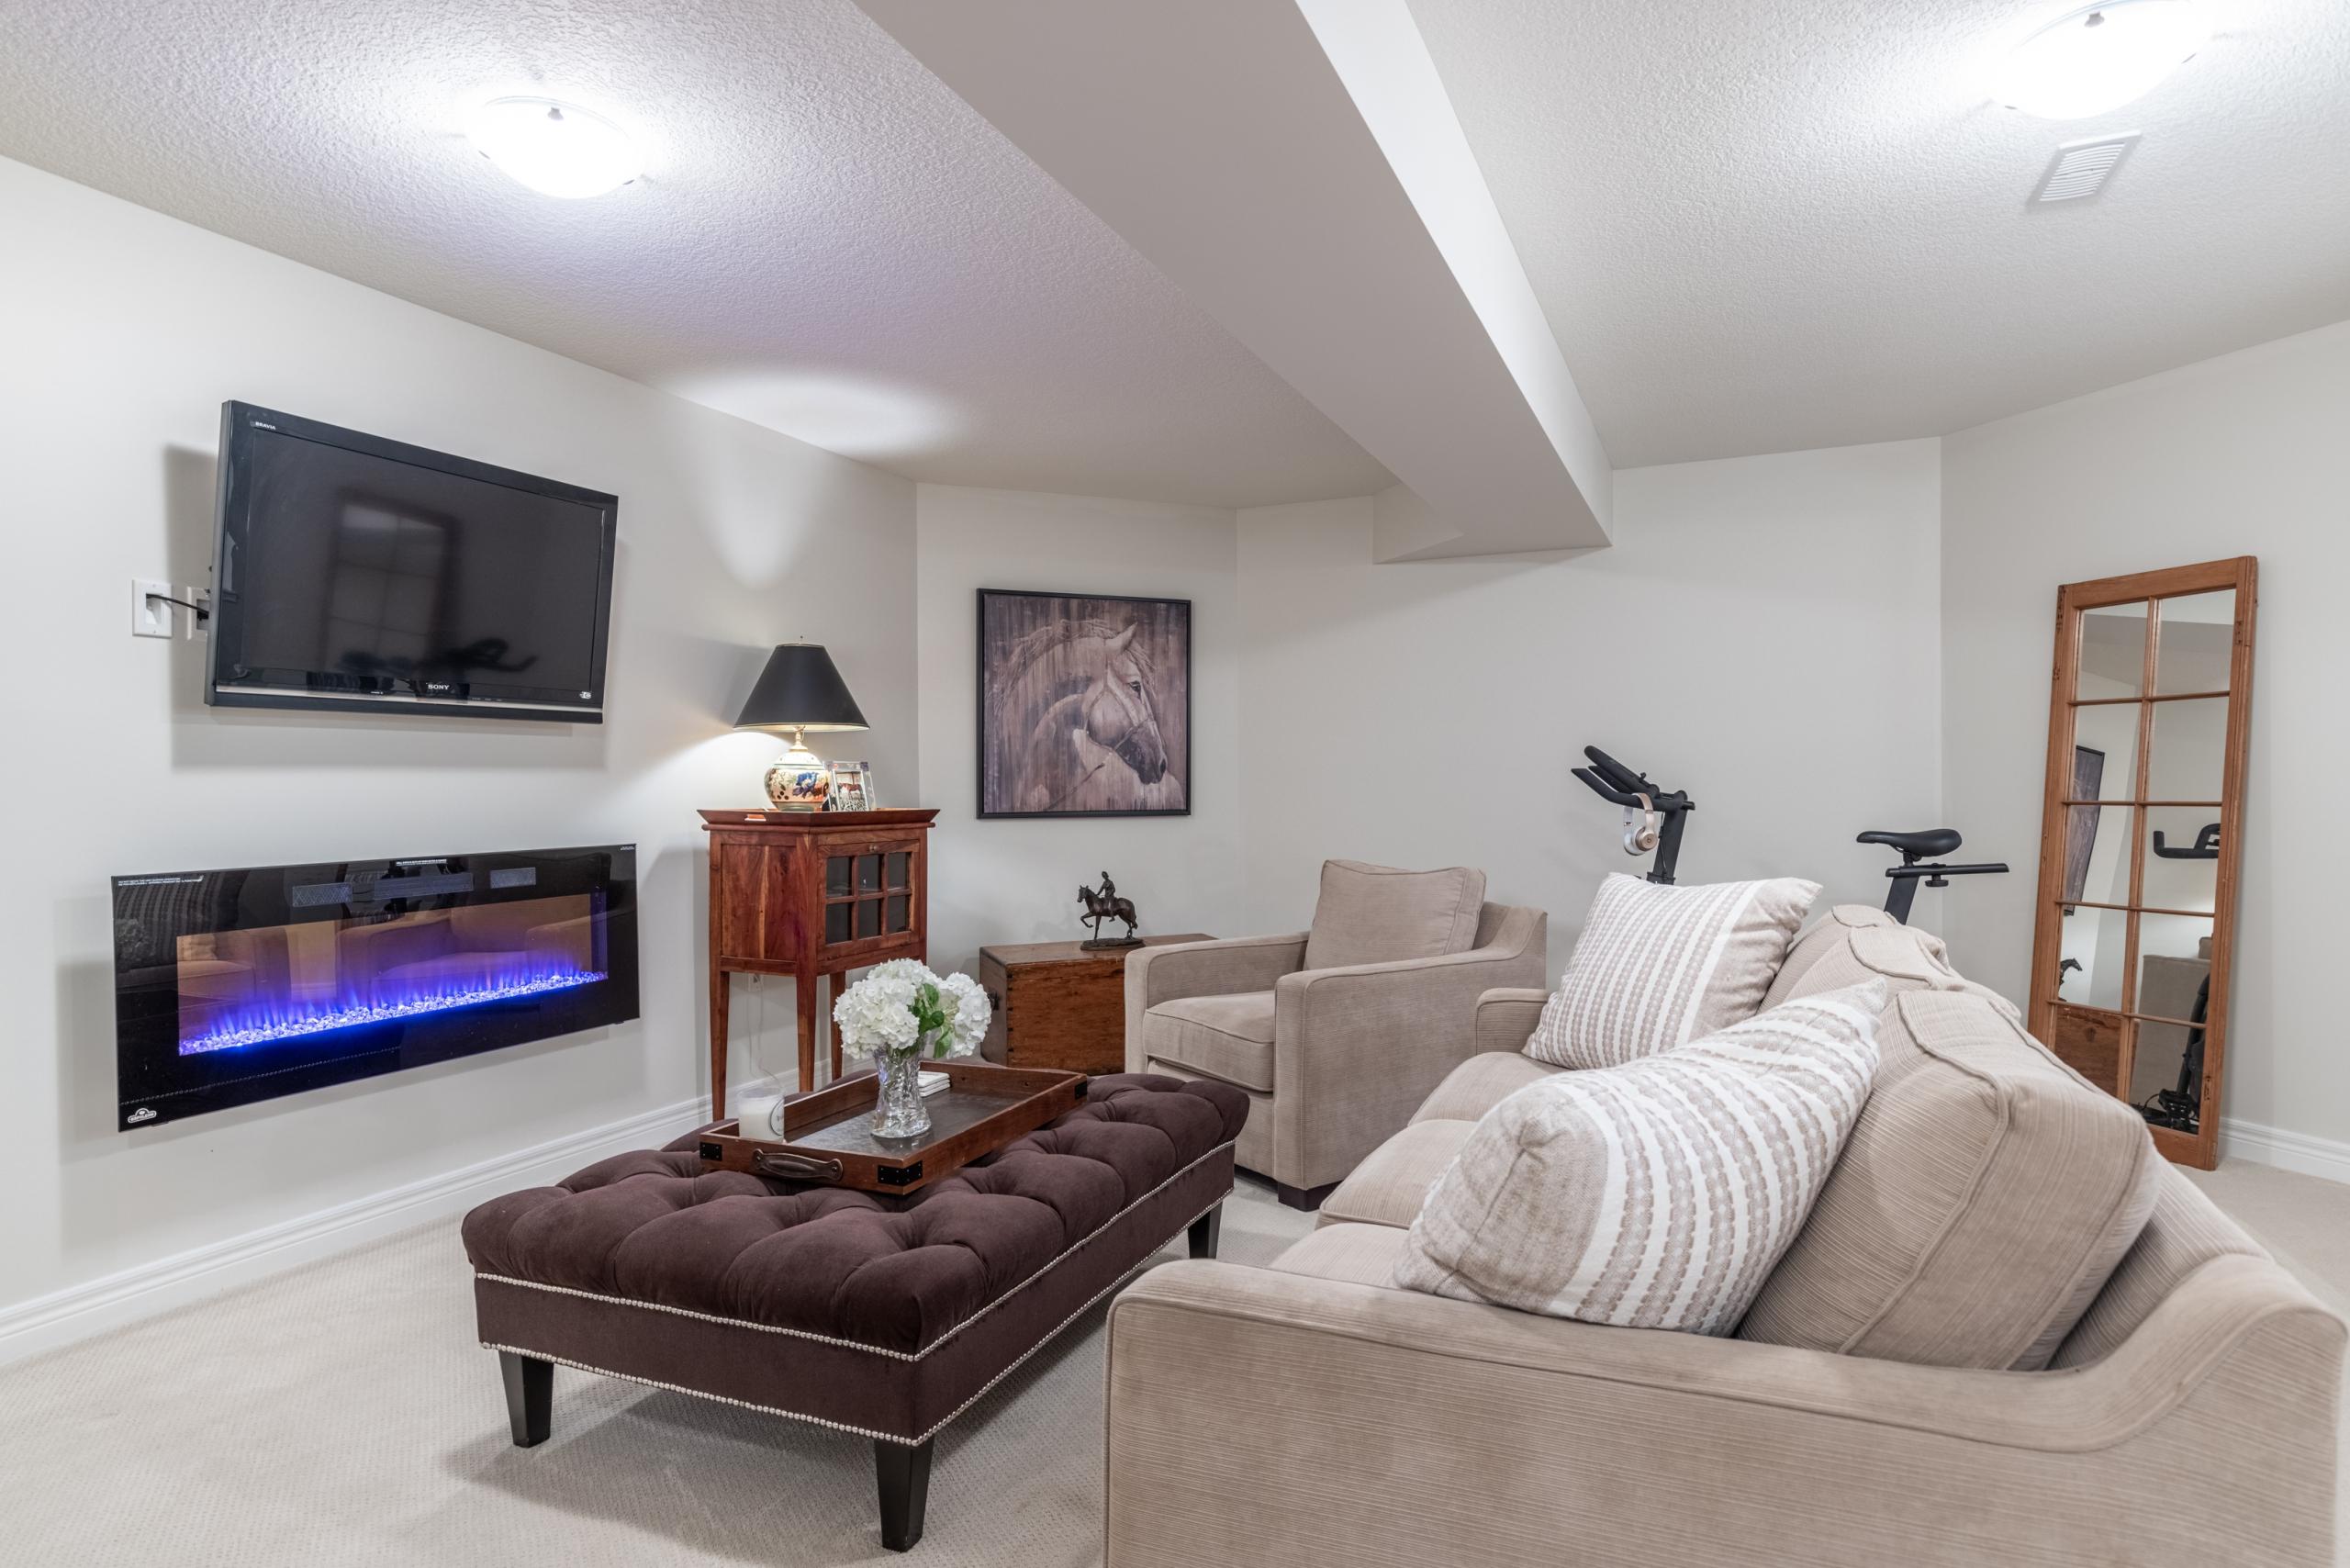 Living room featured at 7 Finton Lane, Binbrook, ON at Alex Irish & Associates